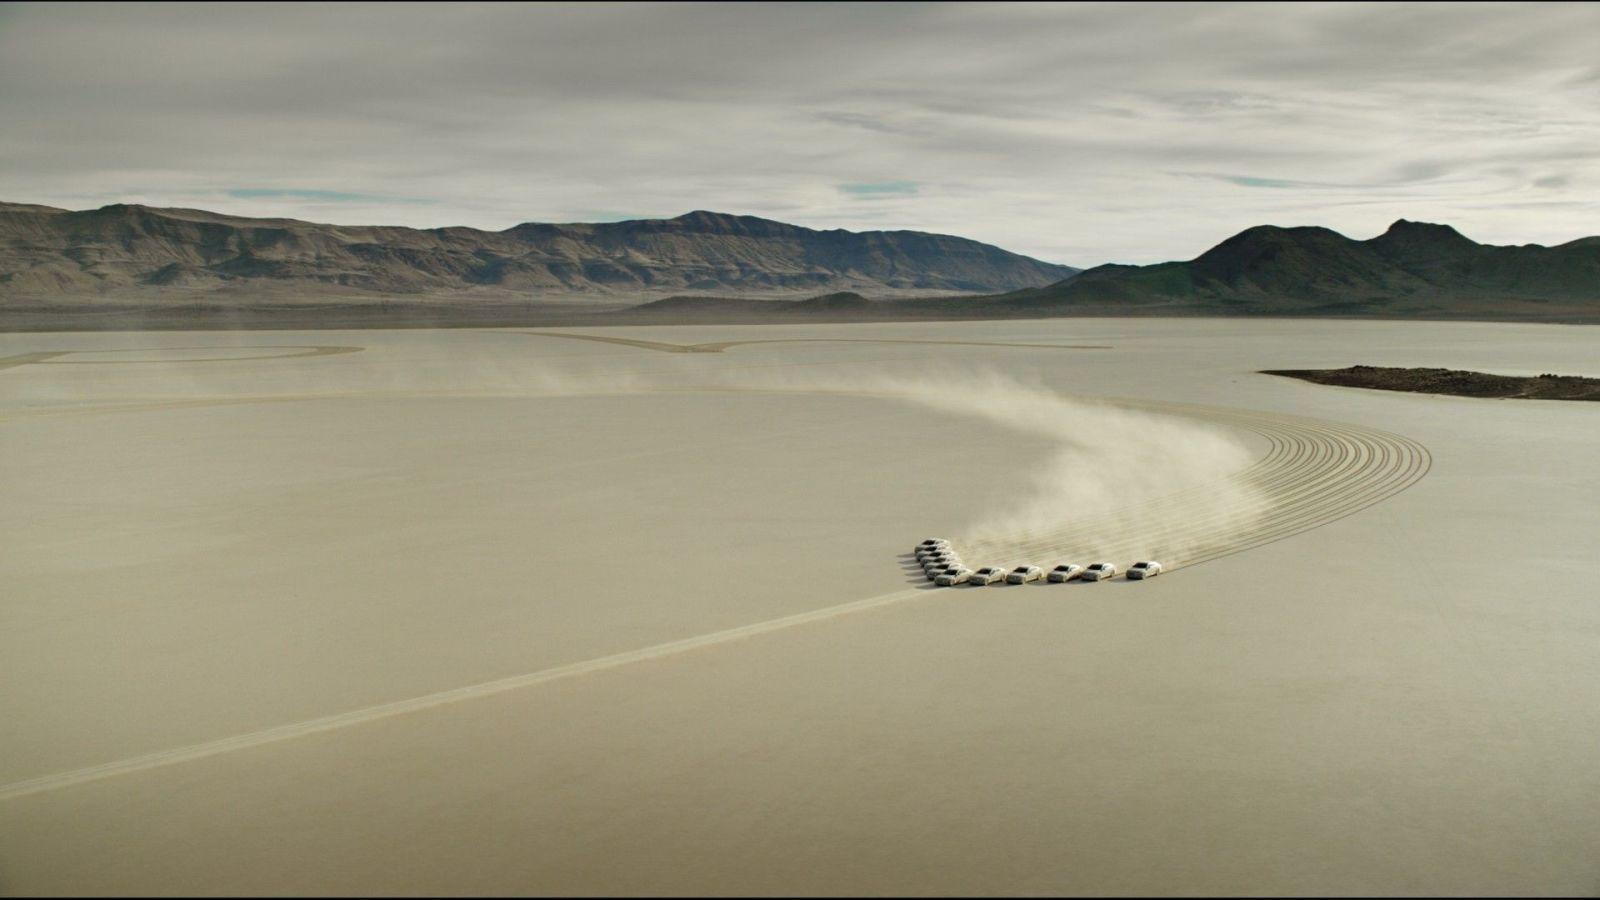 Hyundai Sending: A Message to Space